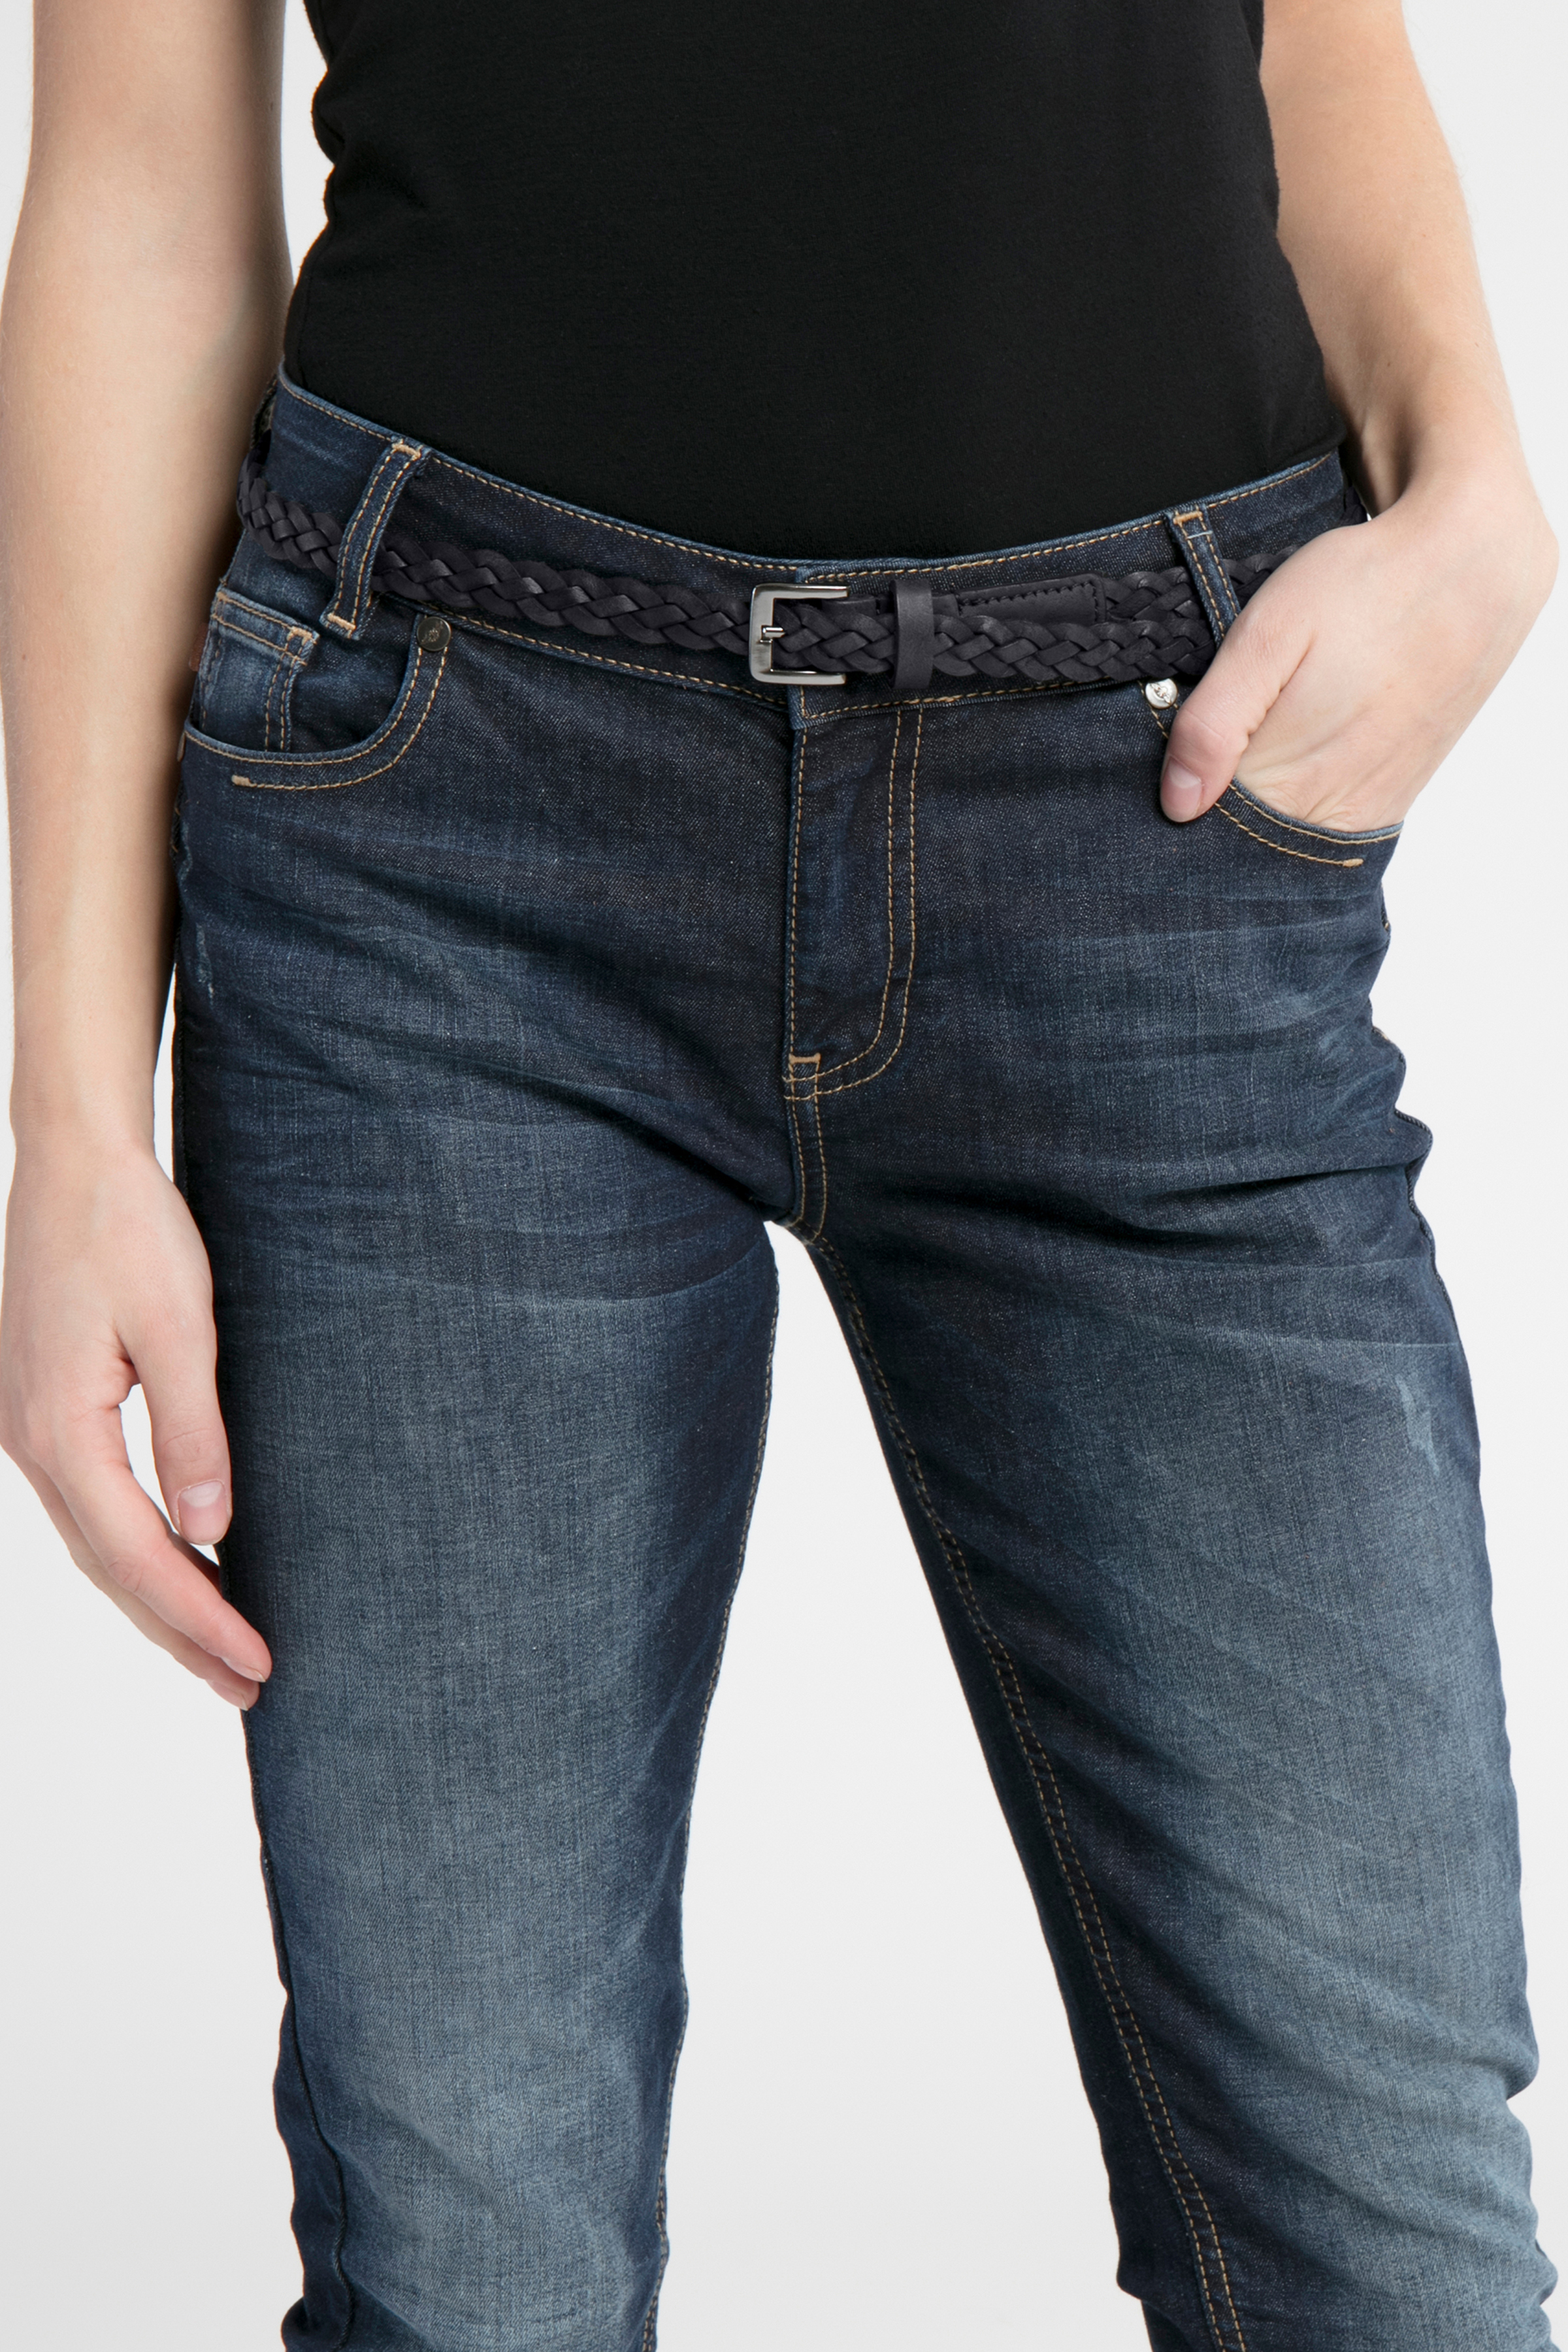 Svart Skinnbälte från Ichi - accessories – Köp Svart Skinnbälte från stl. 80-100 här